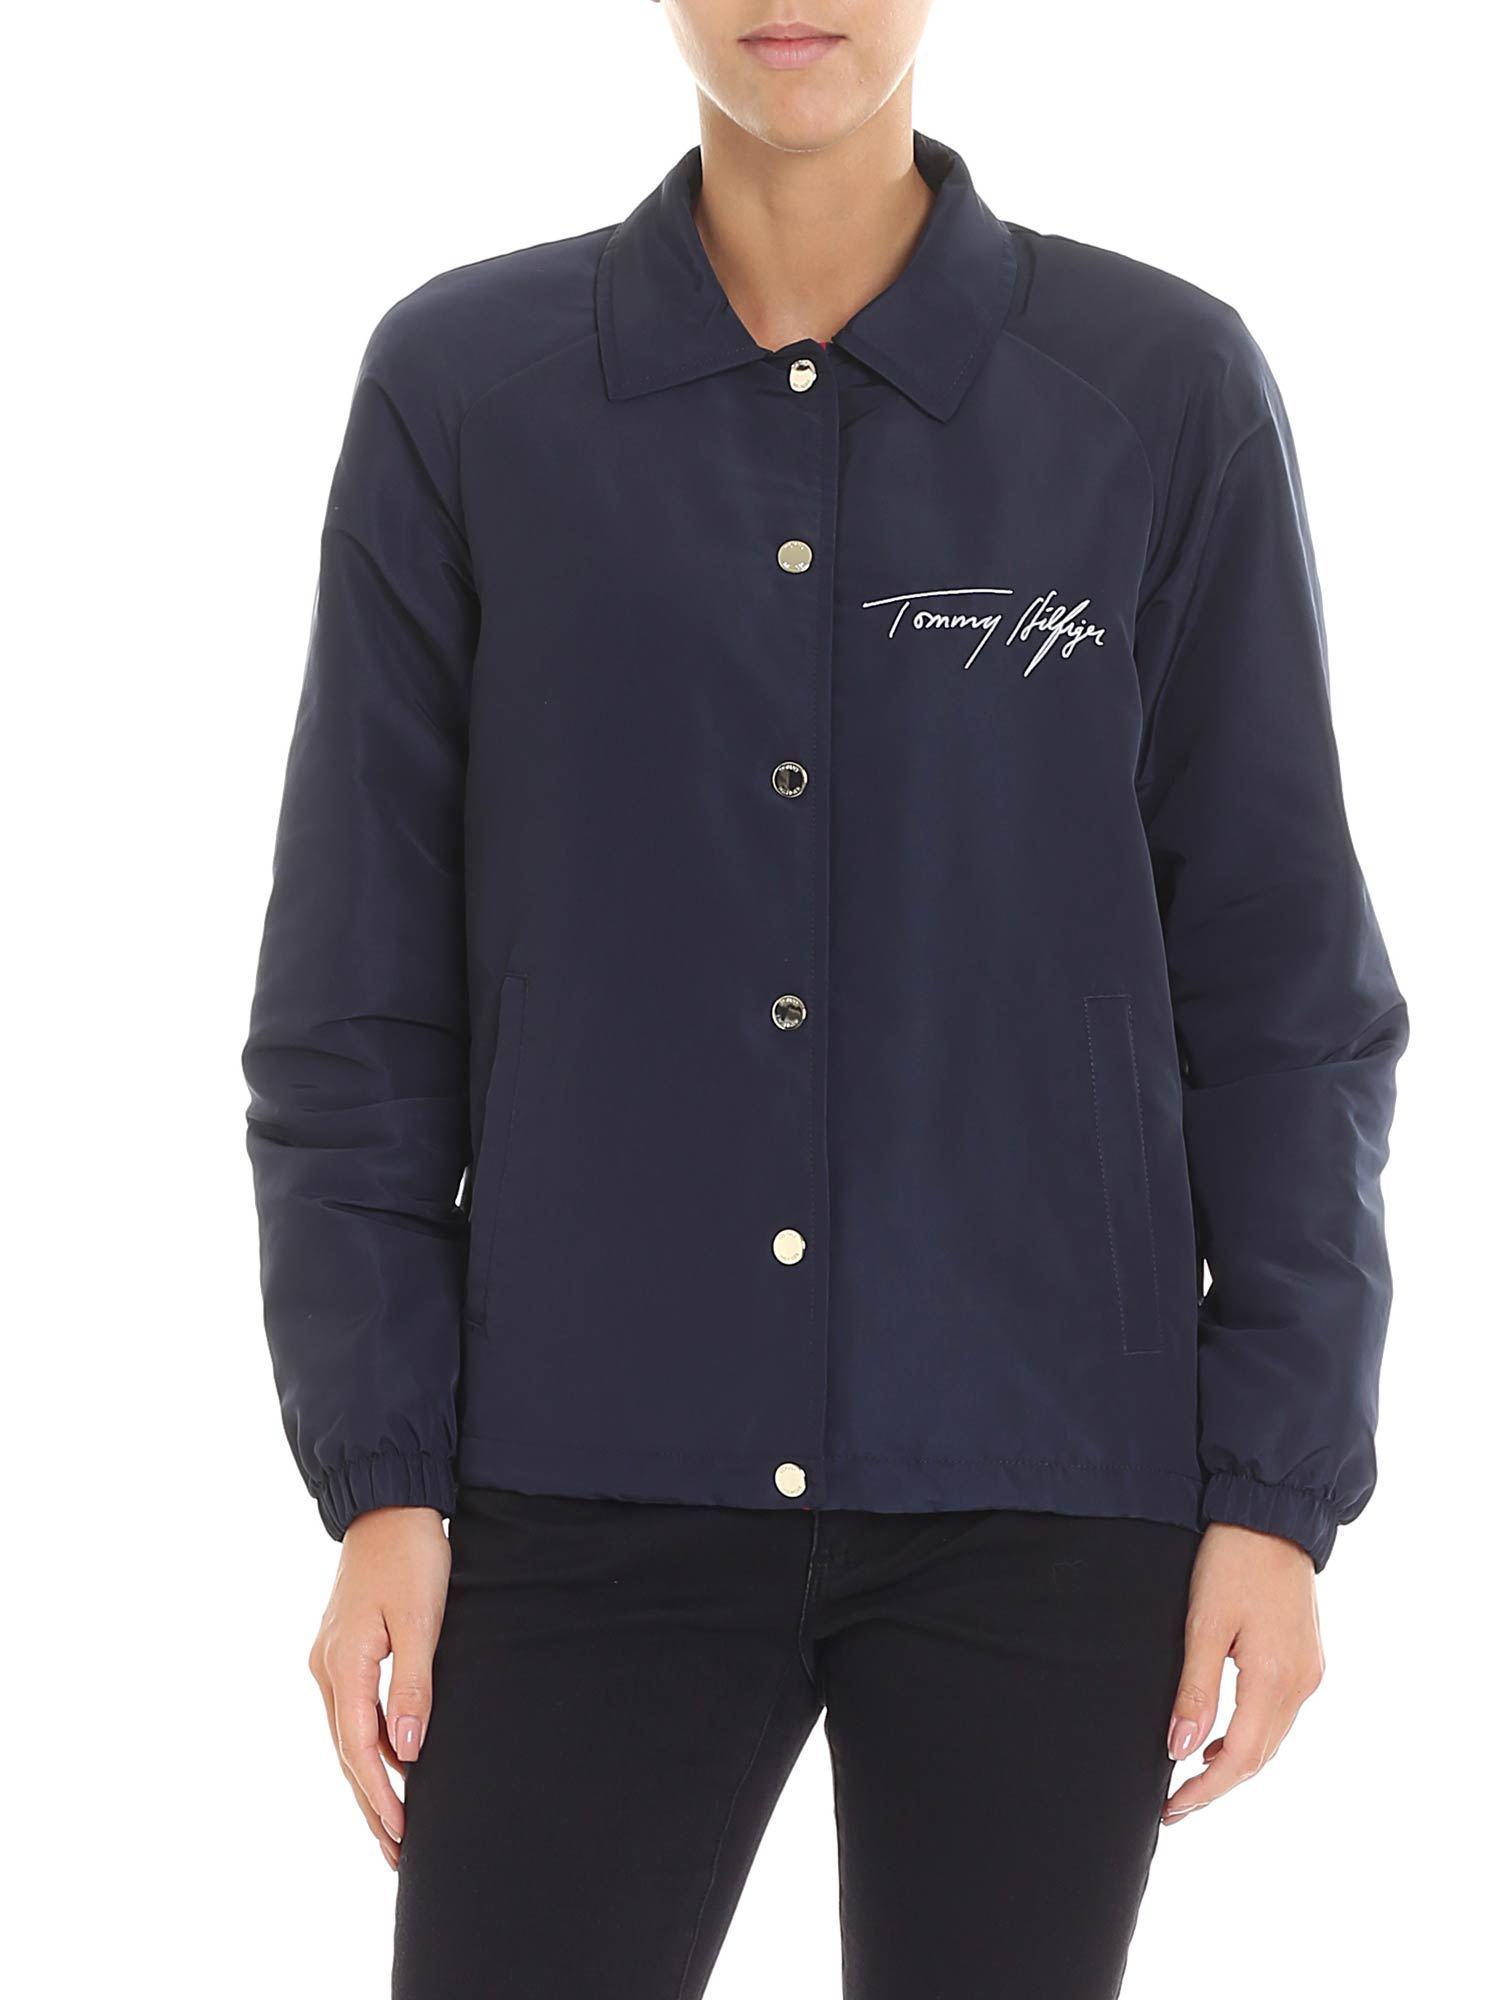 Tommy Hilfiger Amber Blue Jacket in Blue - Lyst 88aef4c101